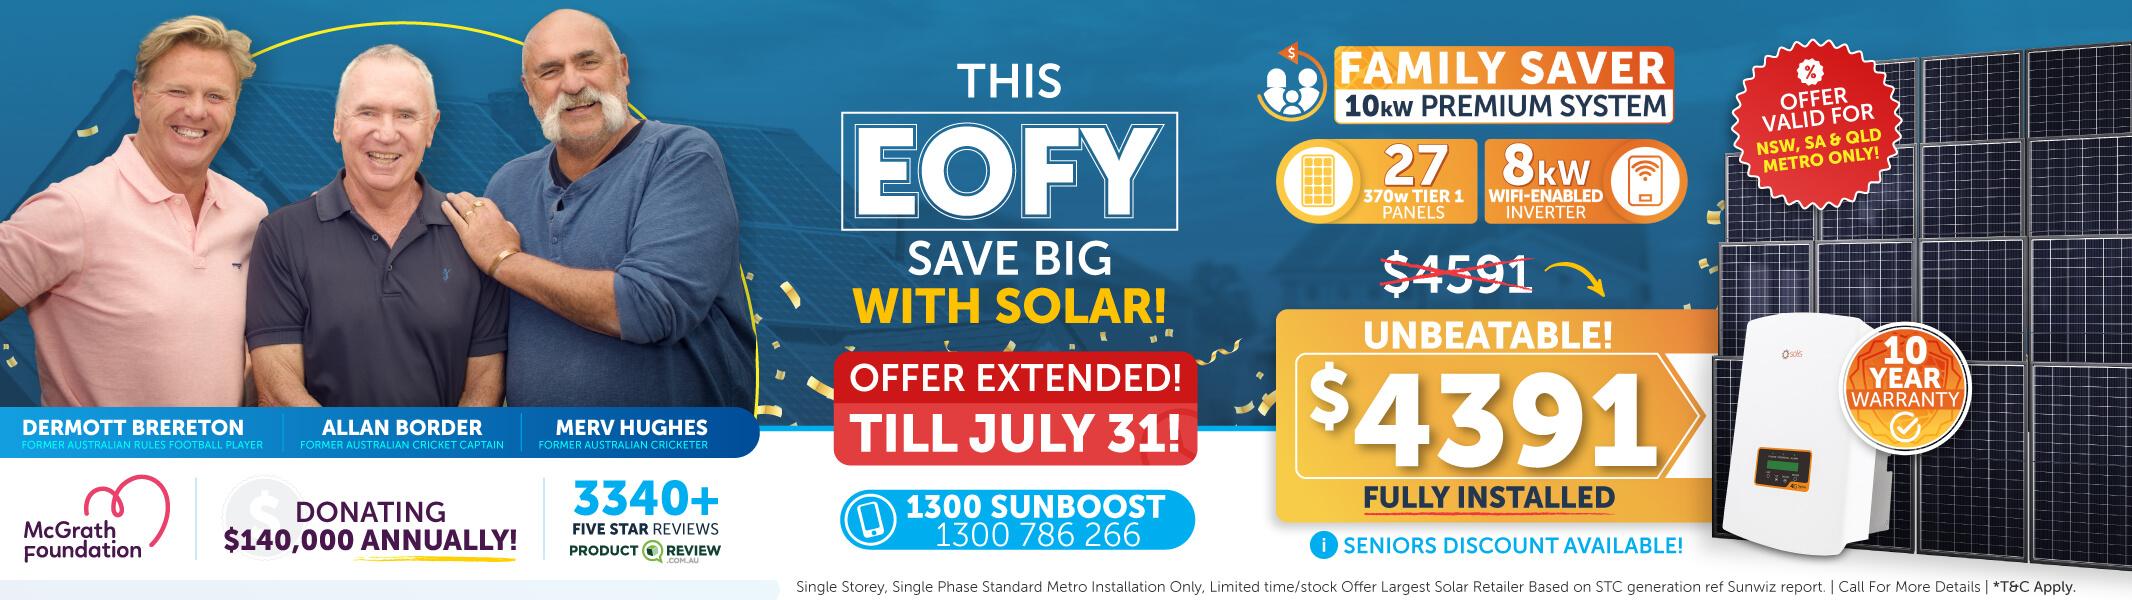 Solar Panel Offer 10 KW Solar System